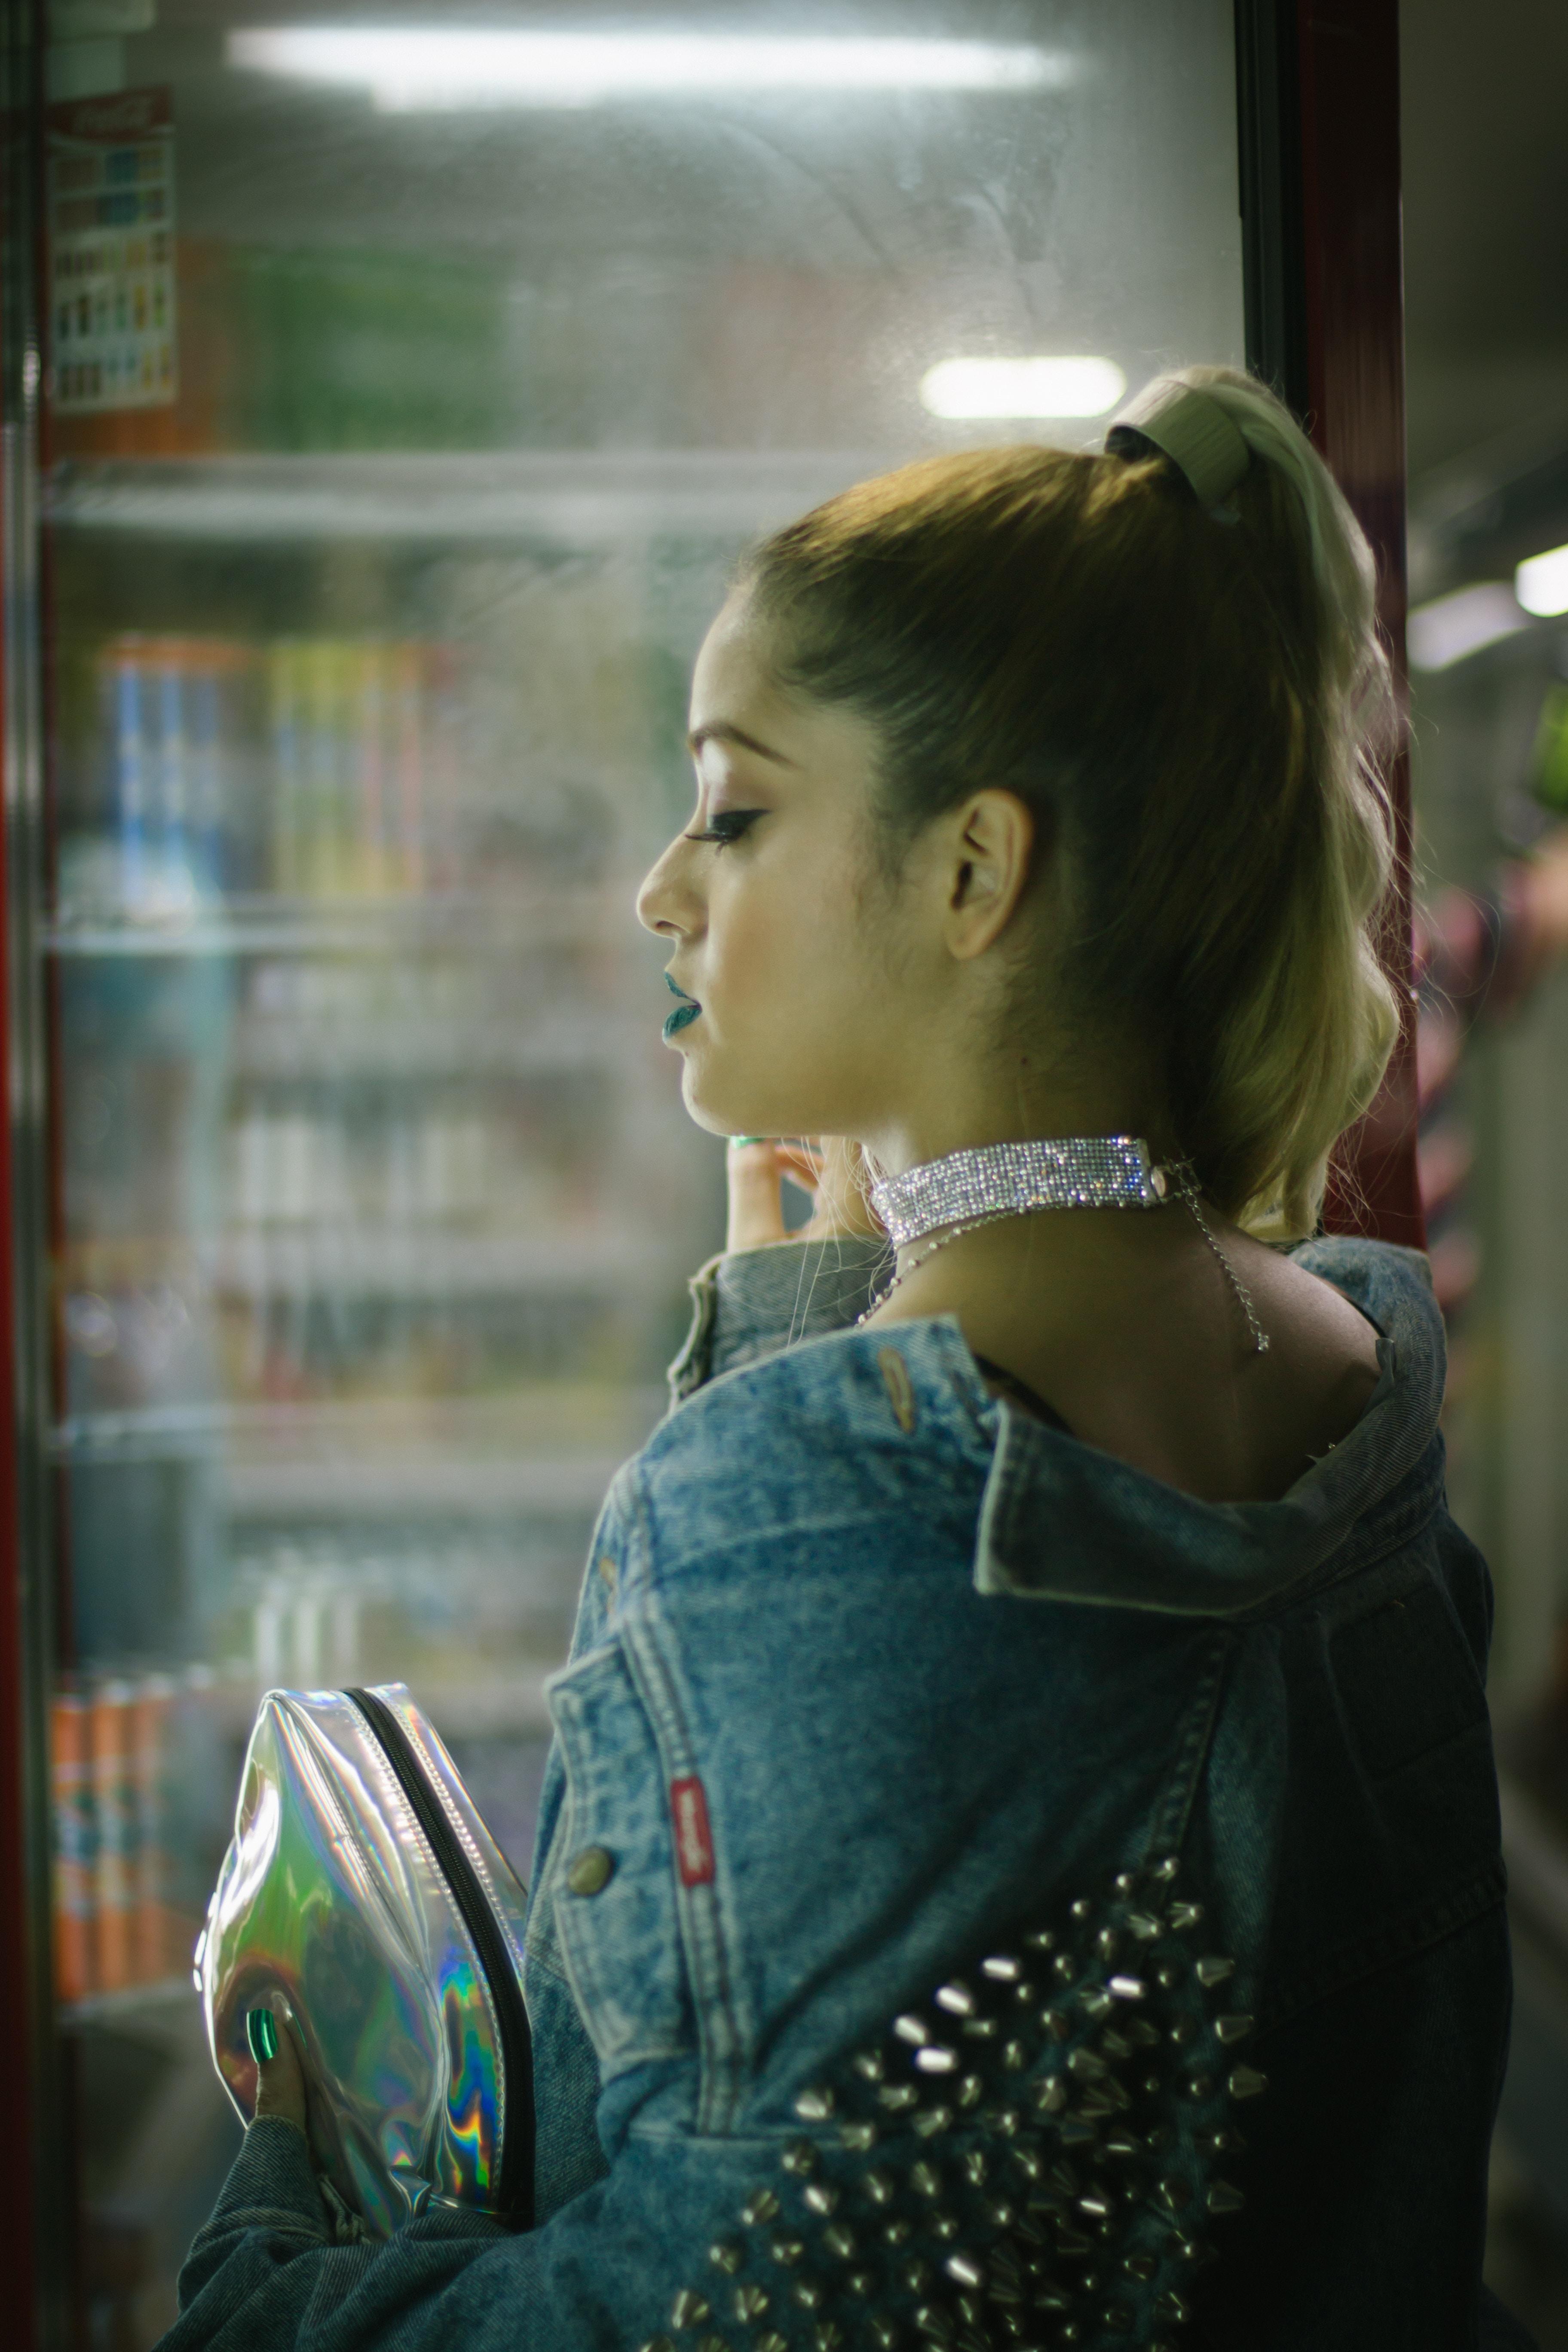 woman standing near the glass facade